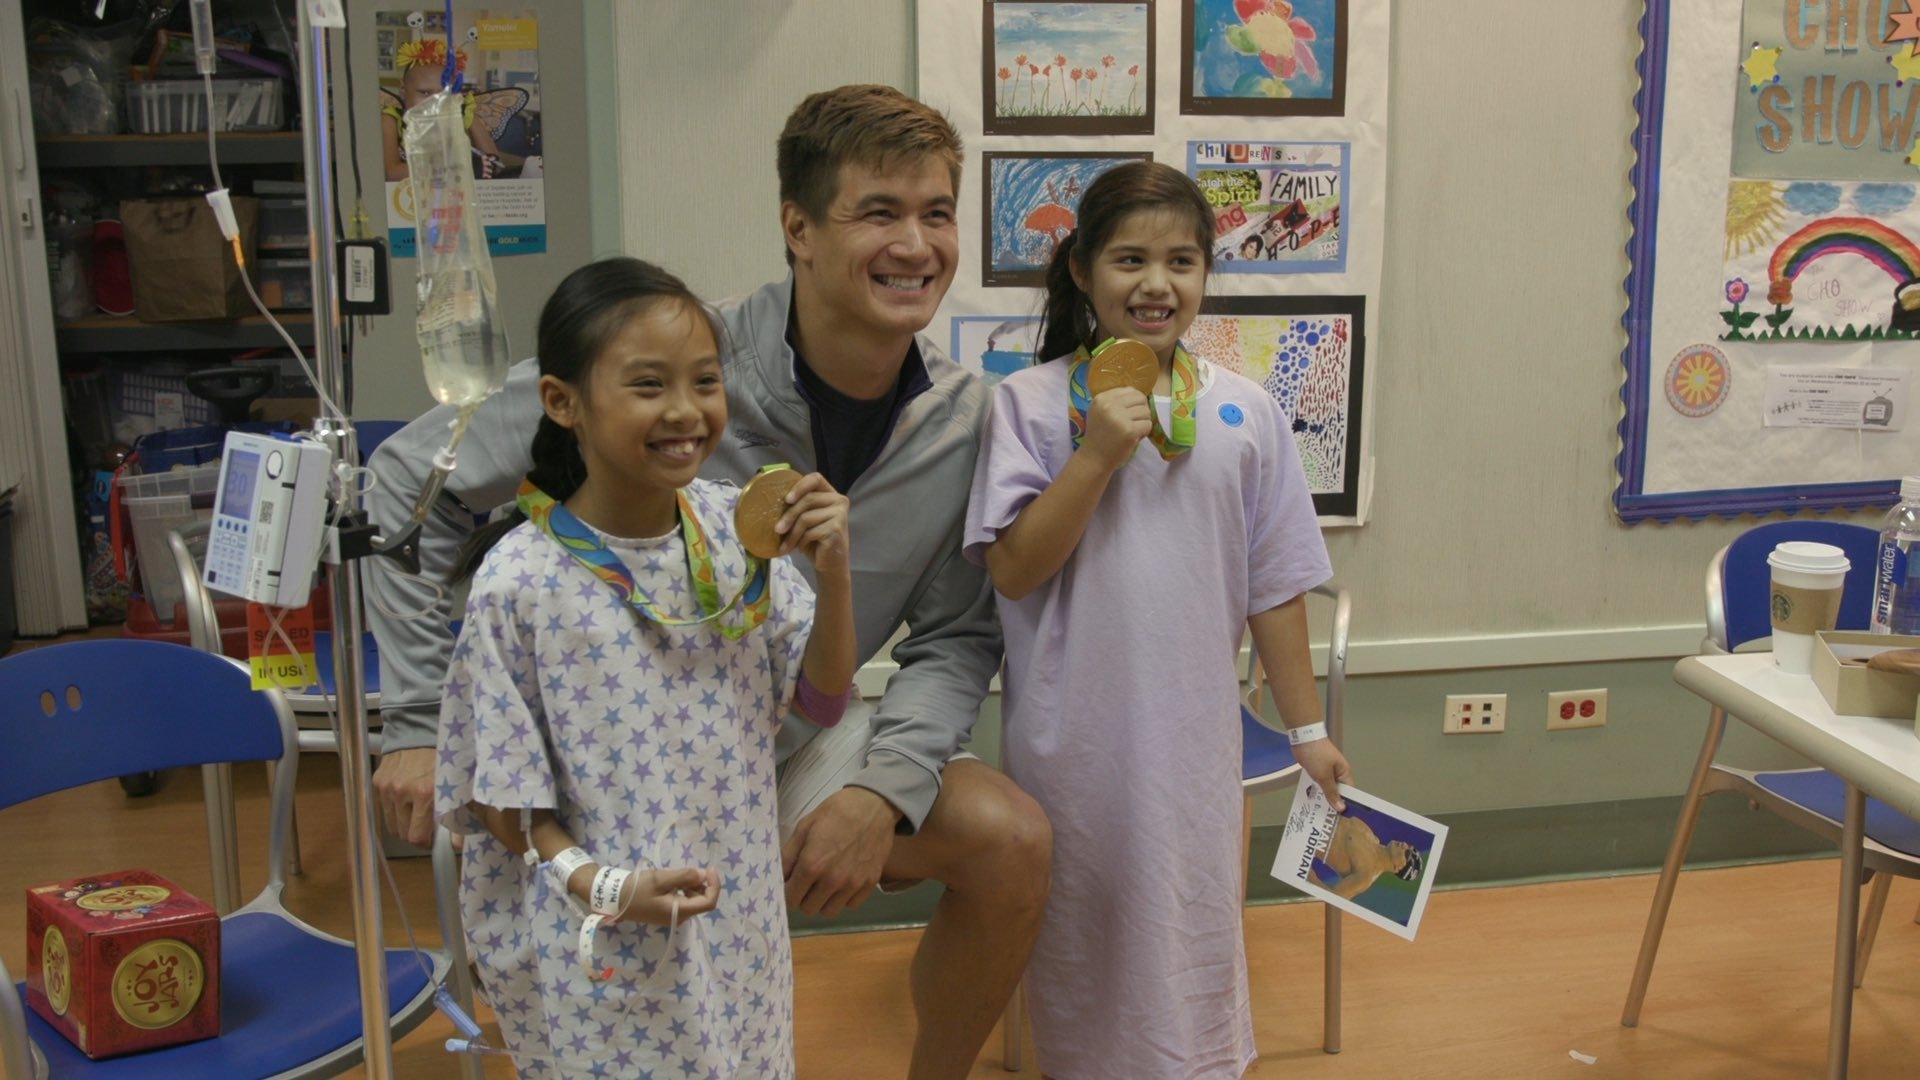 Nathan Adrian Visits Pediatric Hospital